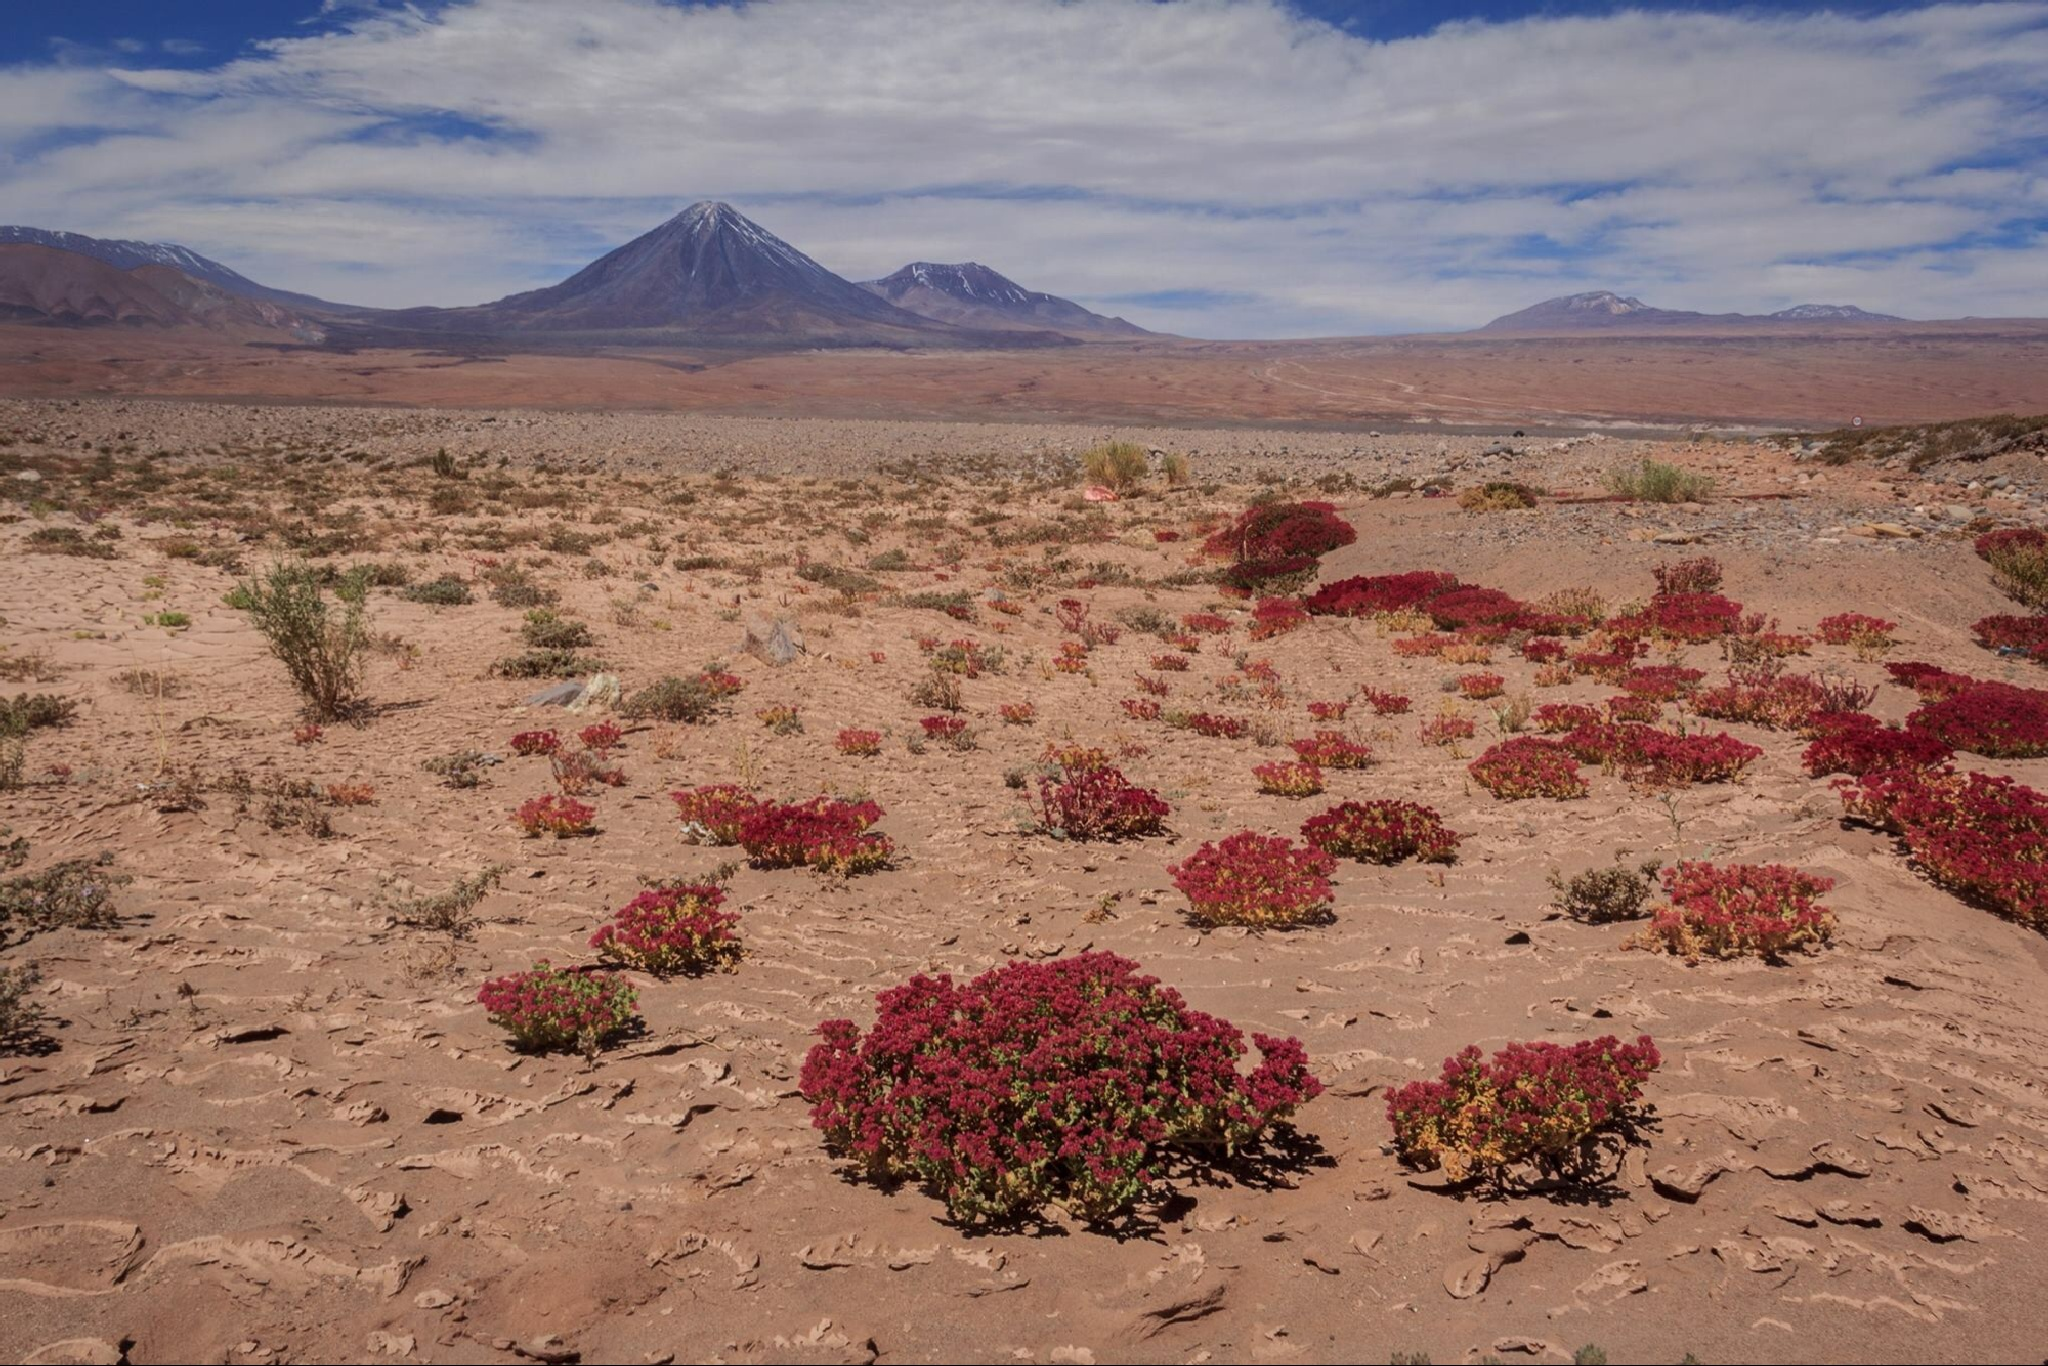 Atacama desert by Liliana